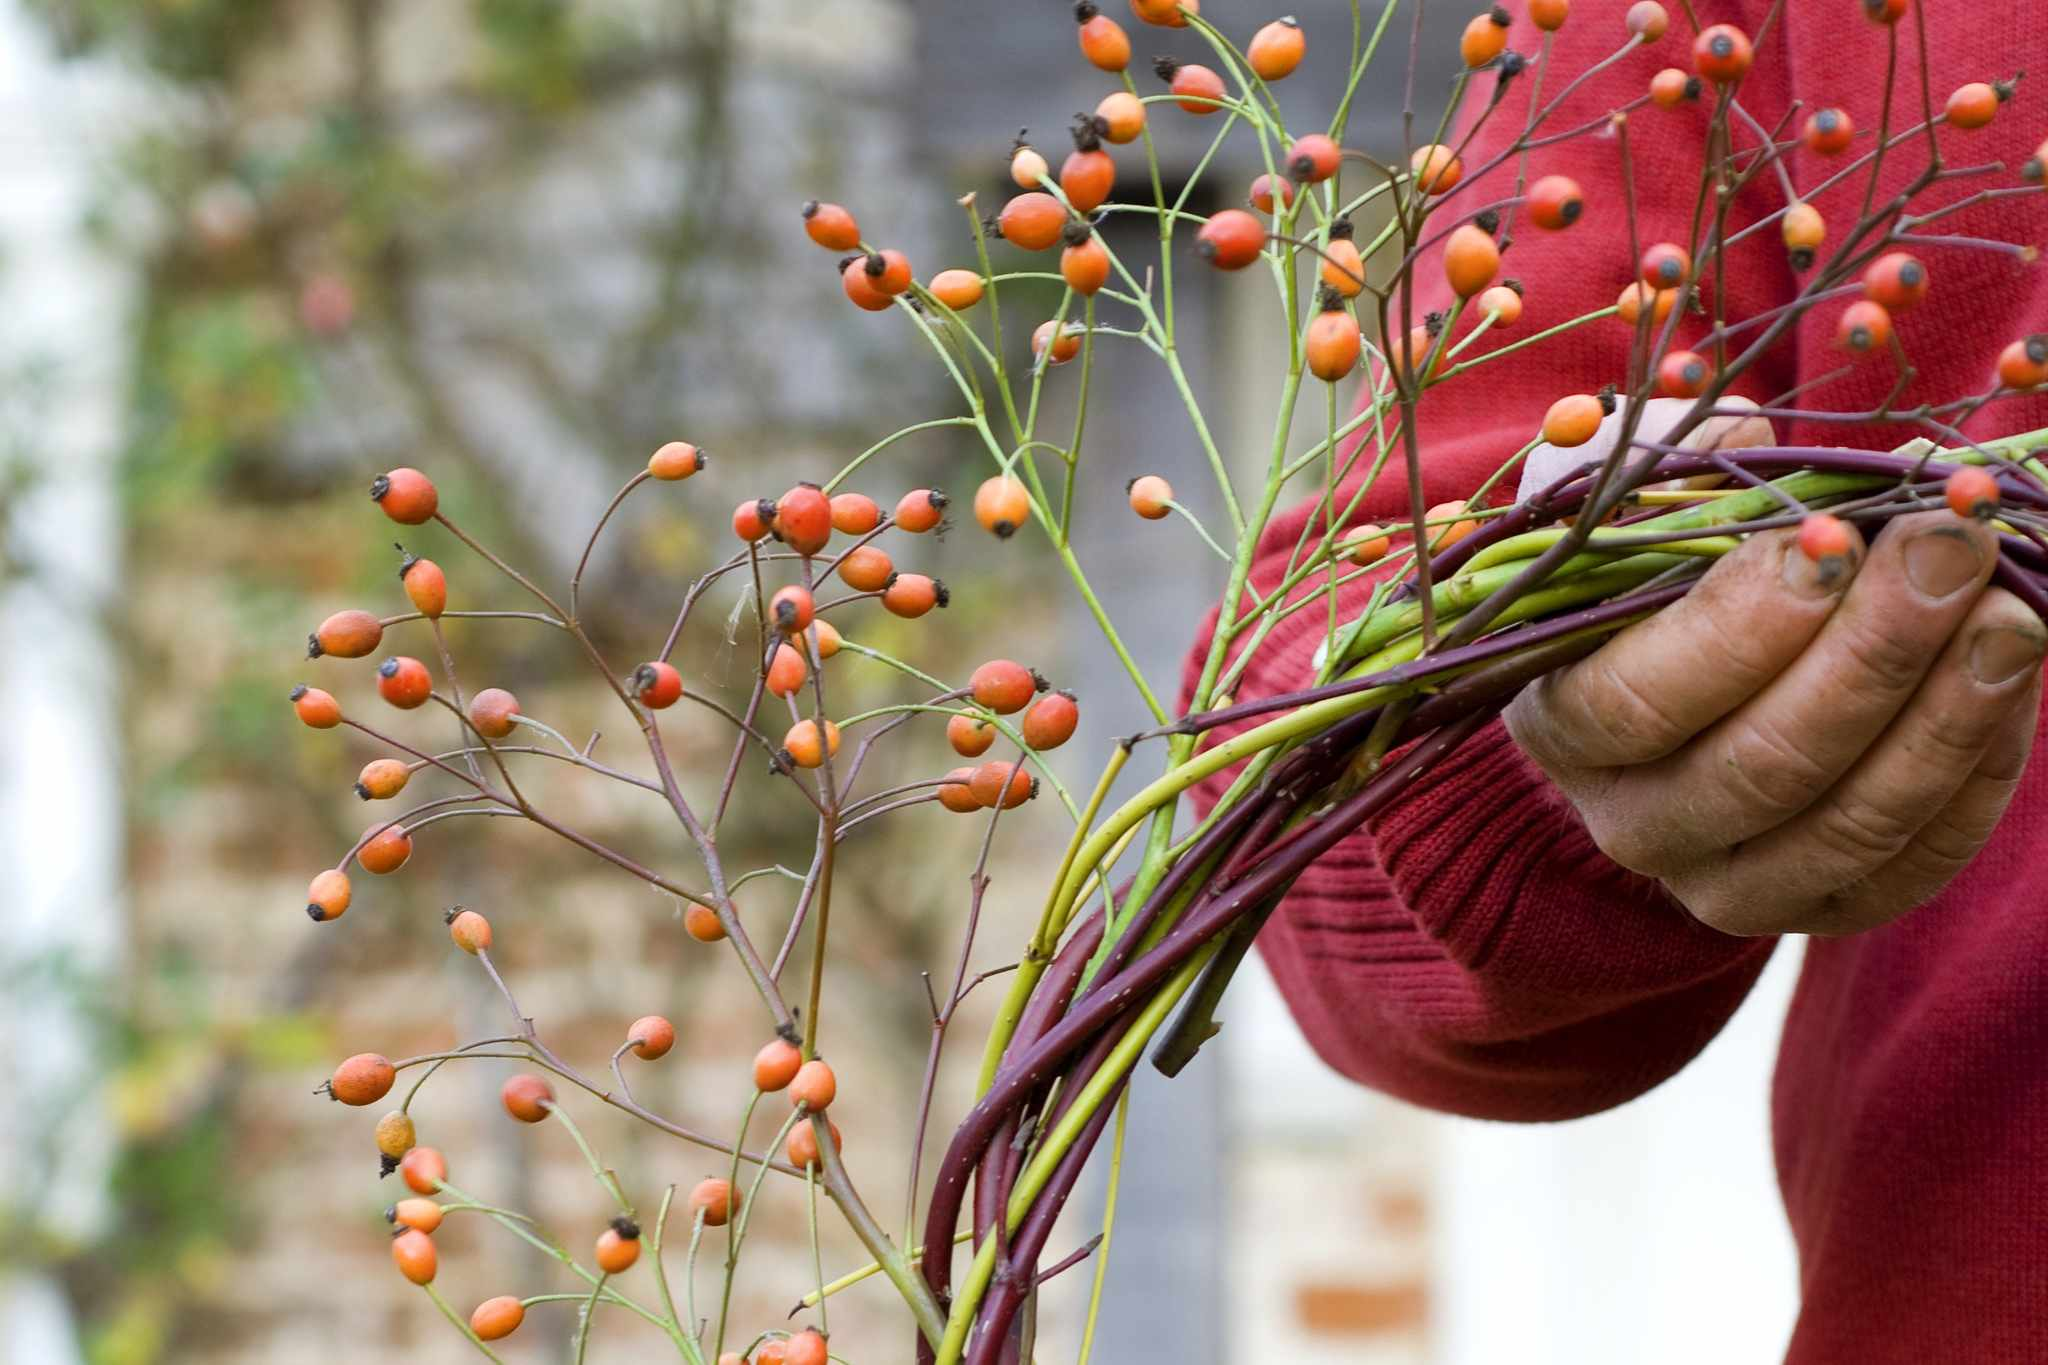 Wildlife-friendly Christmas wreath